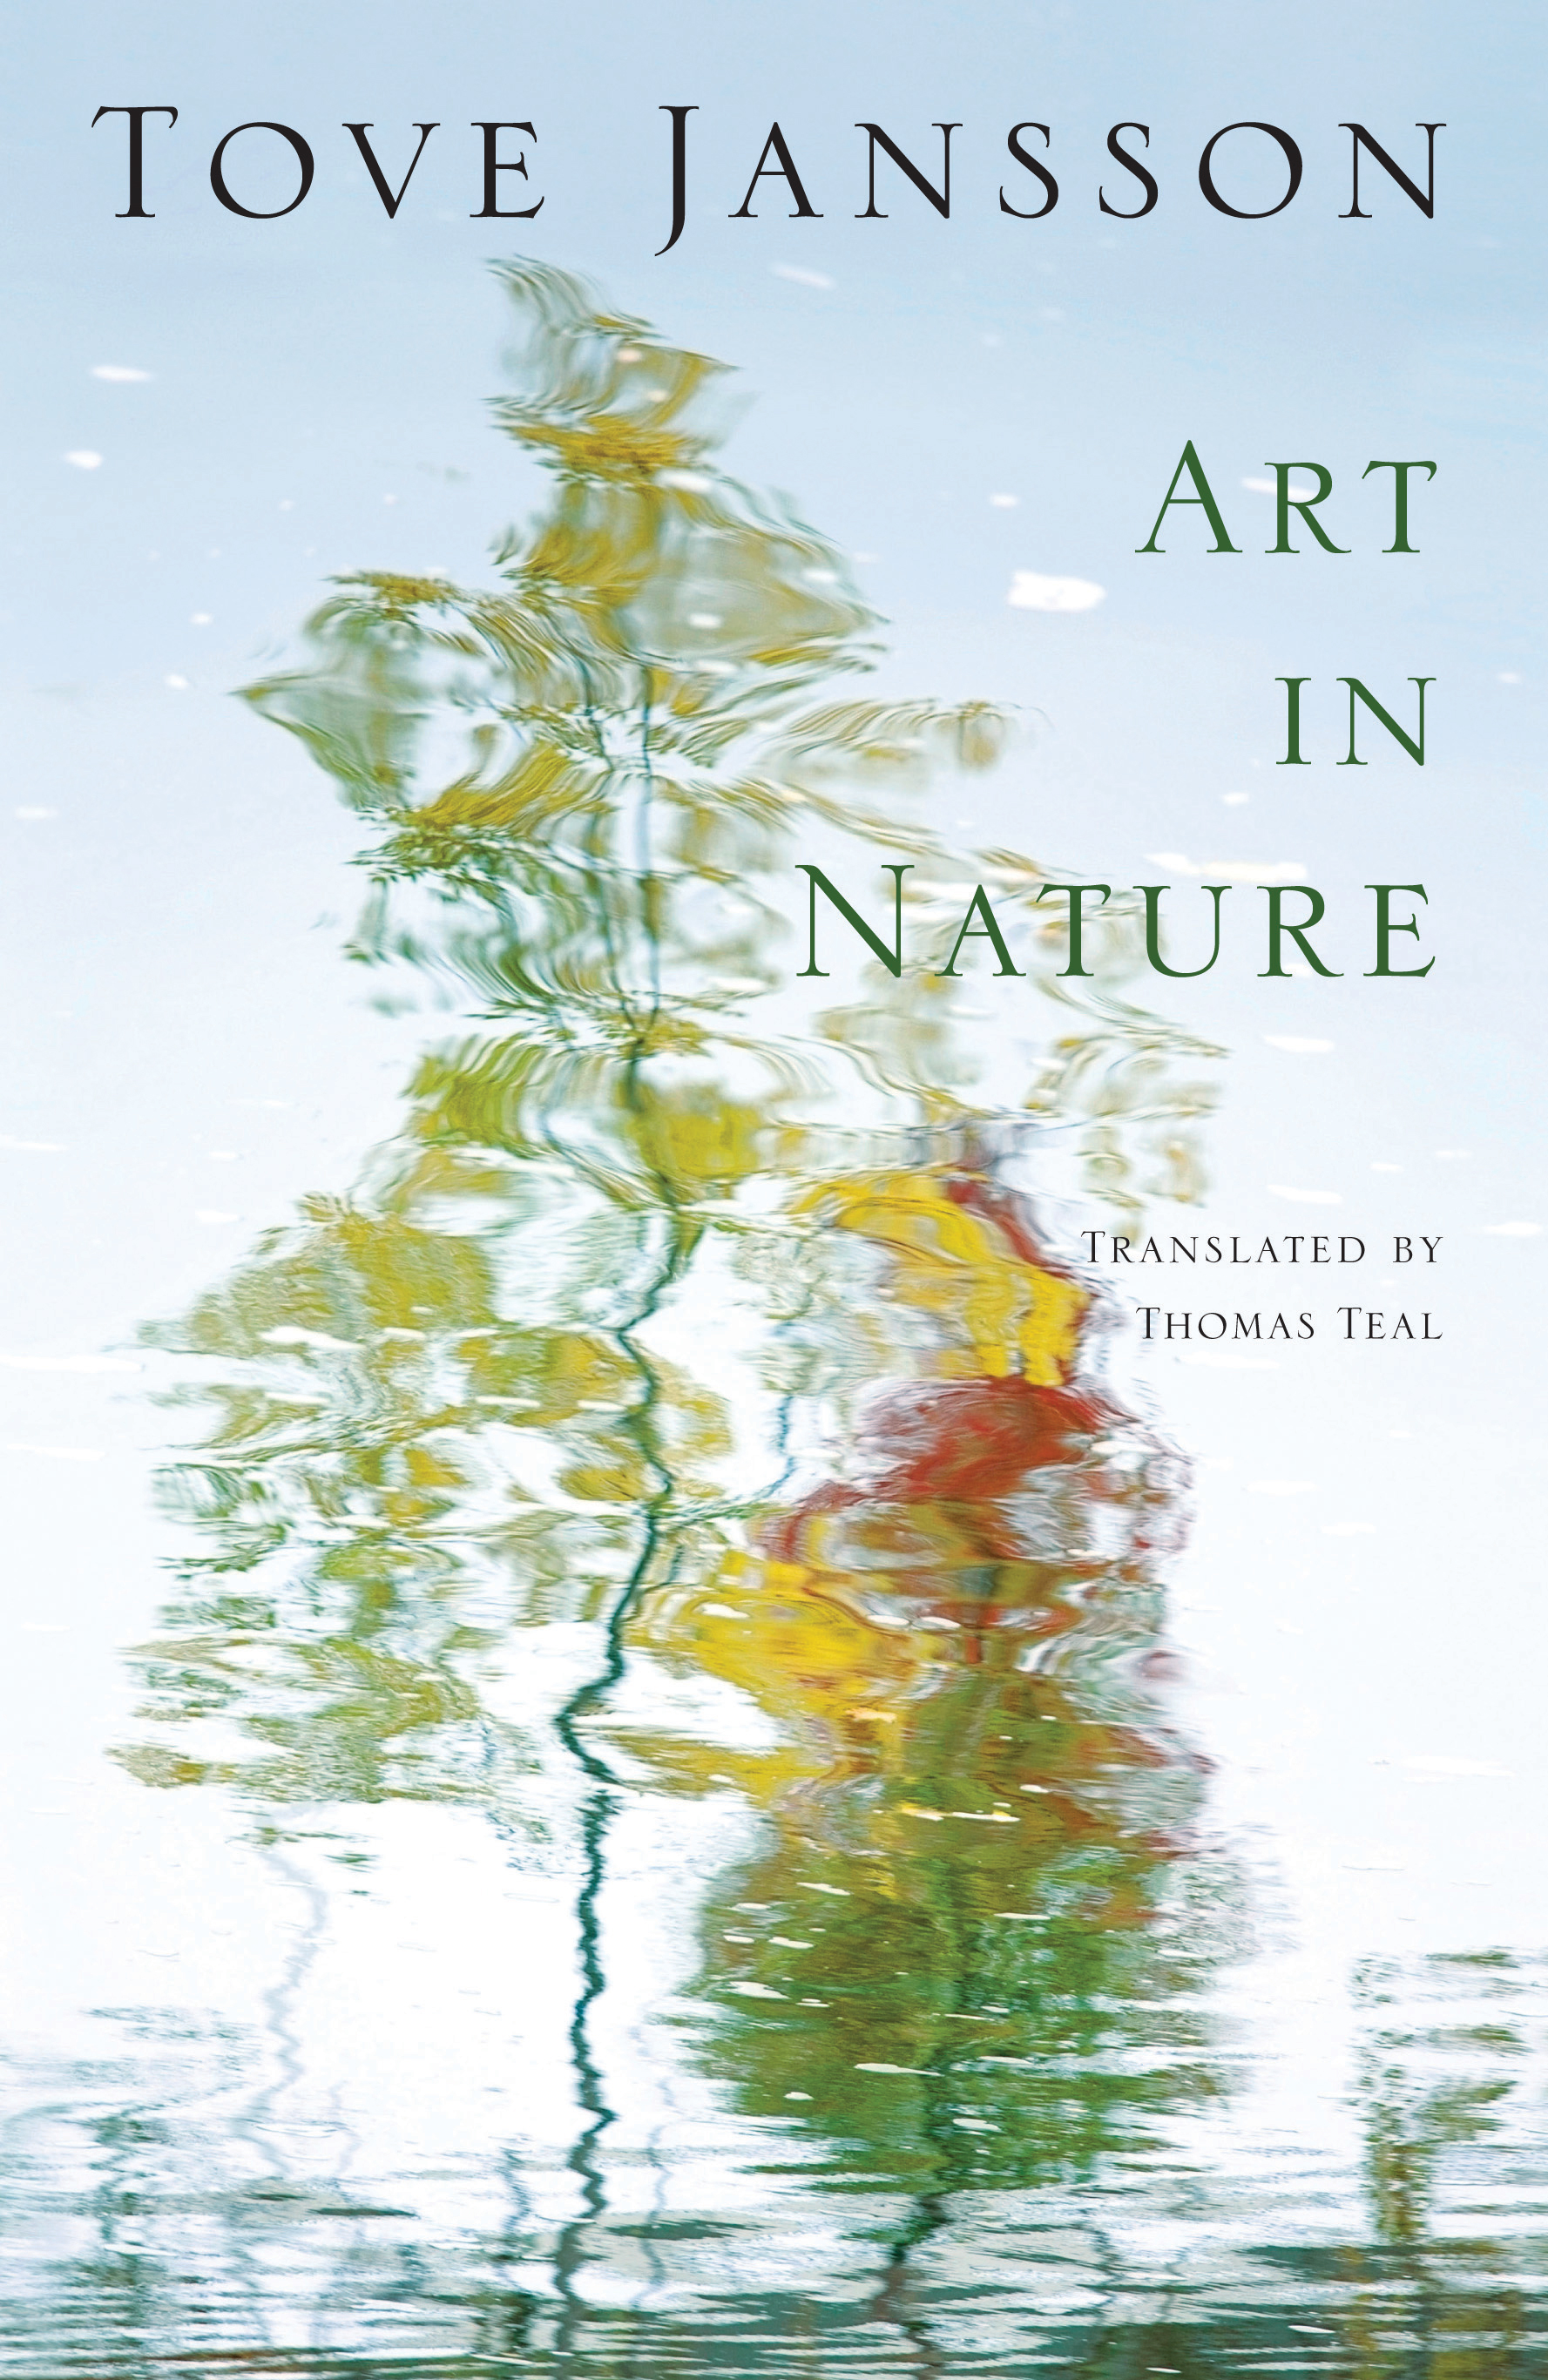 Tove-Jansson-Art-in-Nature-Sort-of-Books.jpg